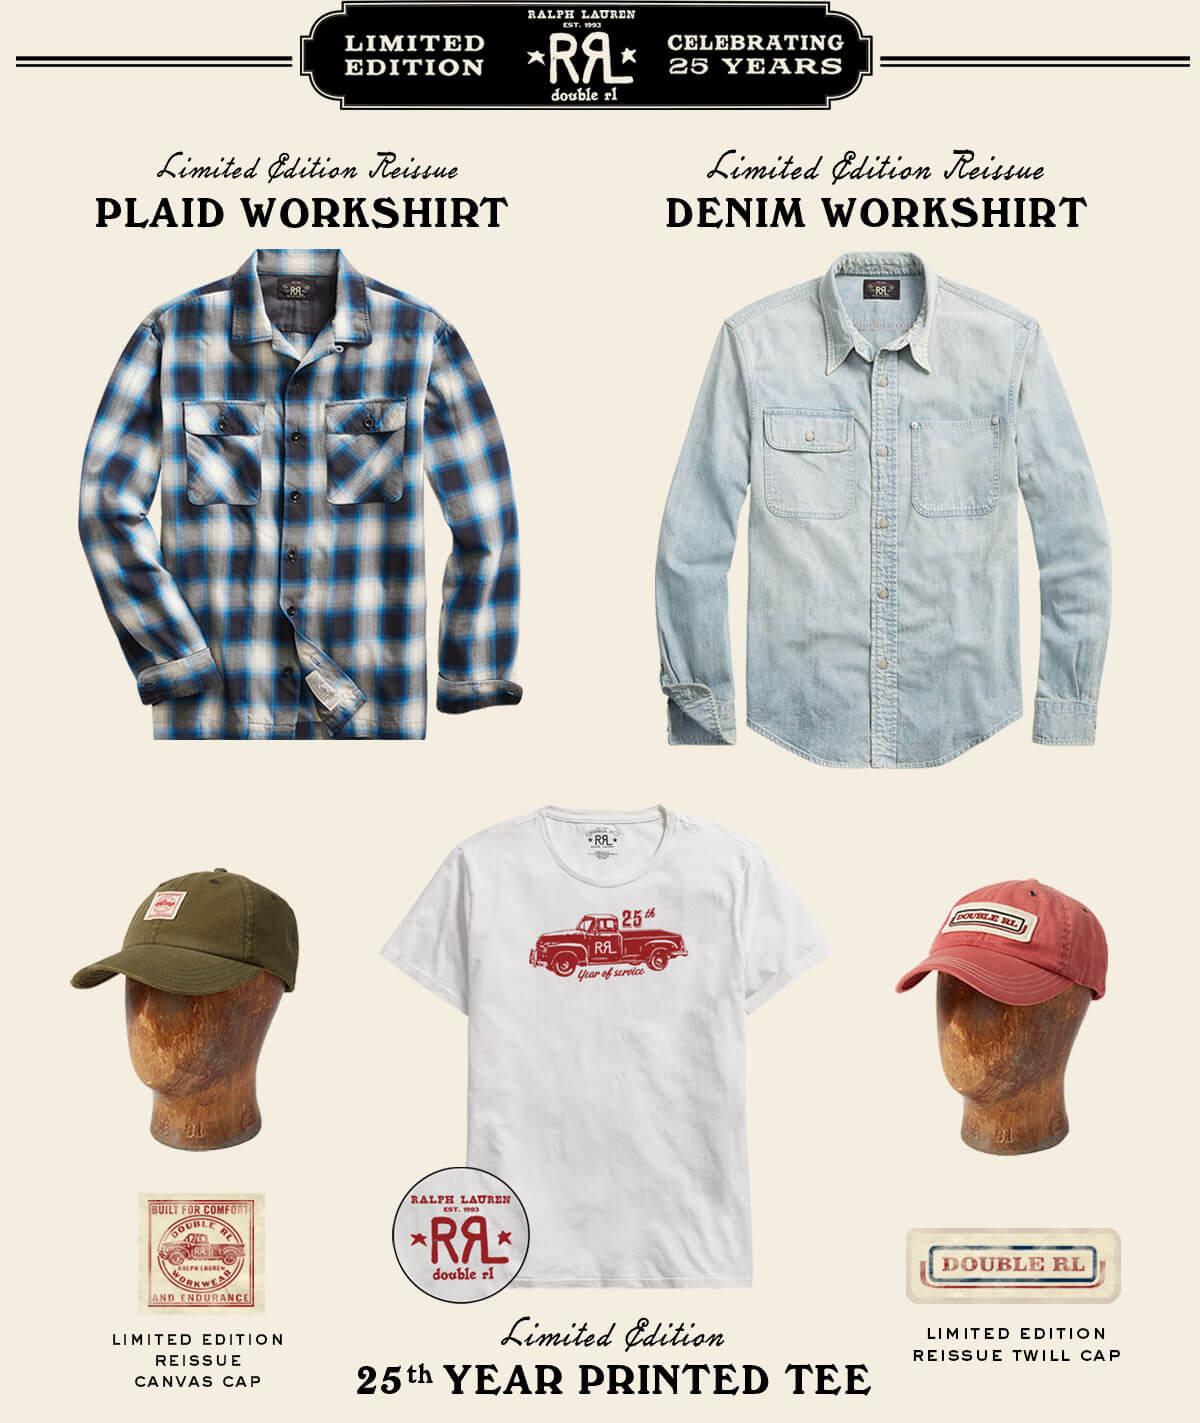 Plaid & denim workshirts, 25th anniversary tee & caps